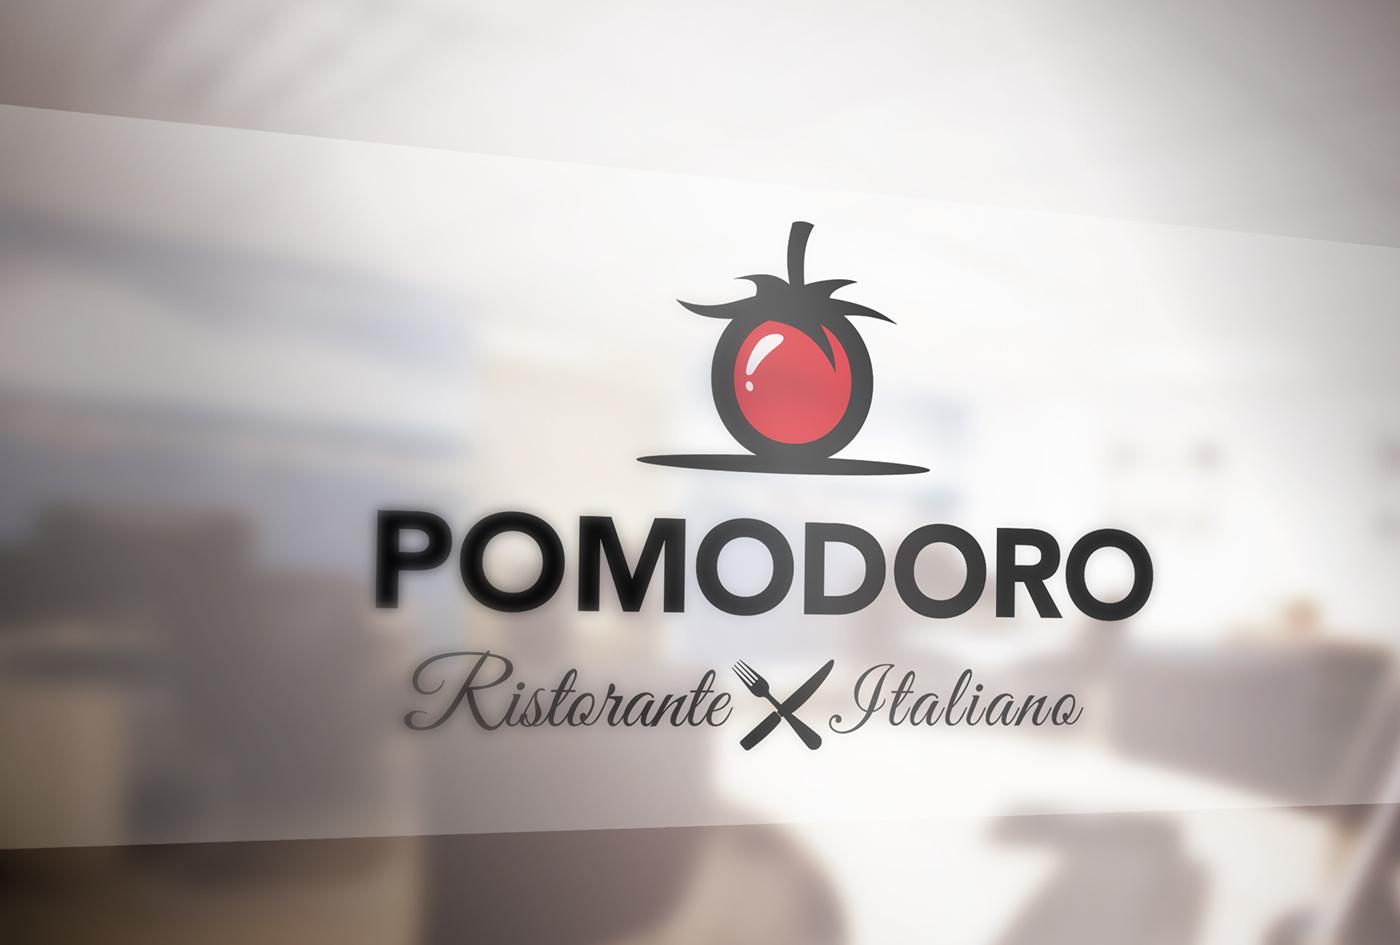 Miss pomodoro nude pics pictures